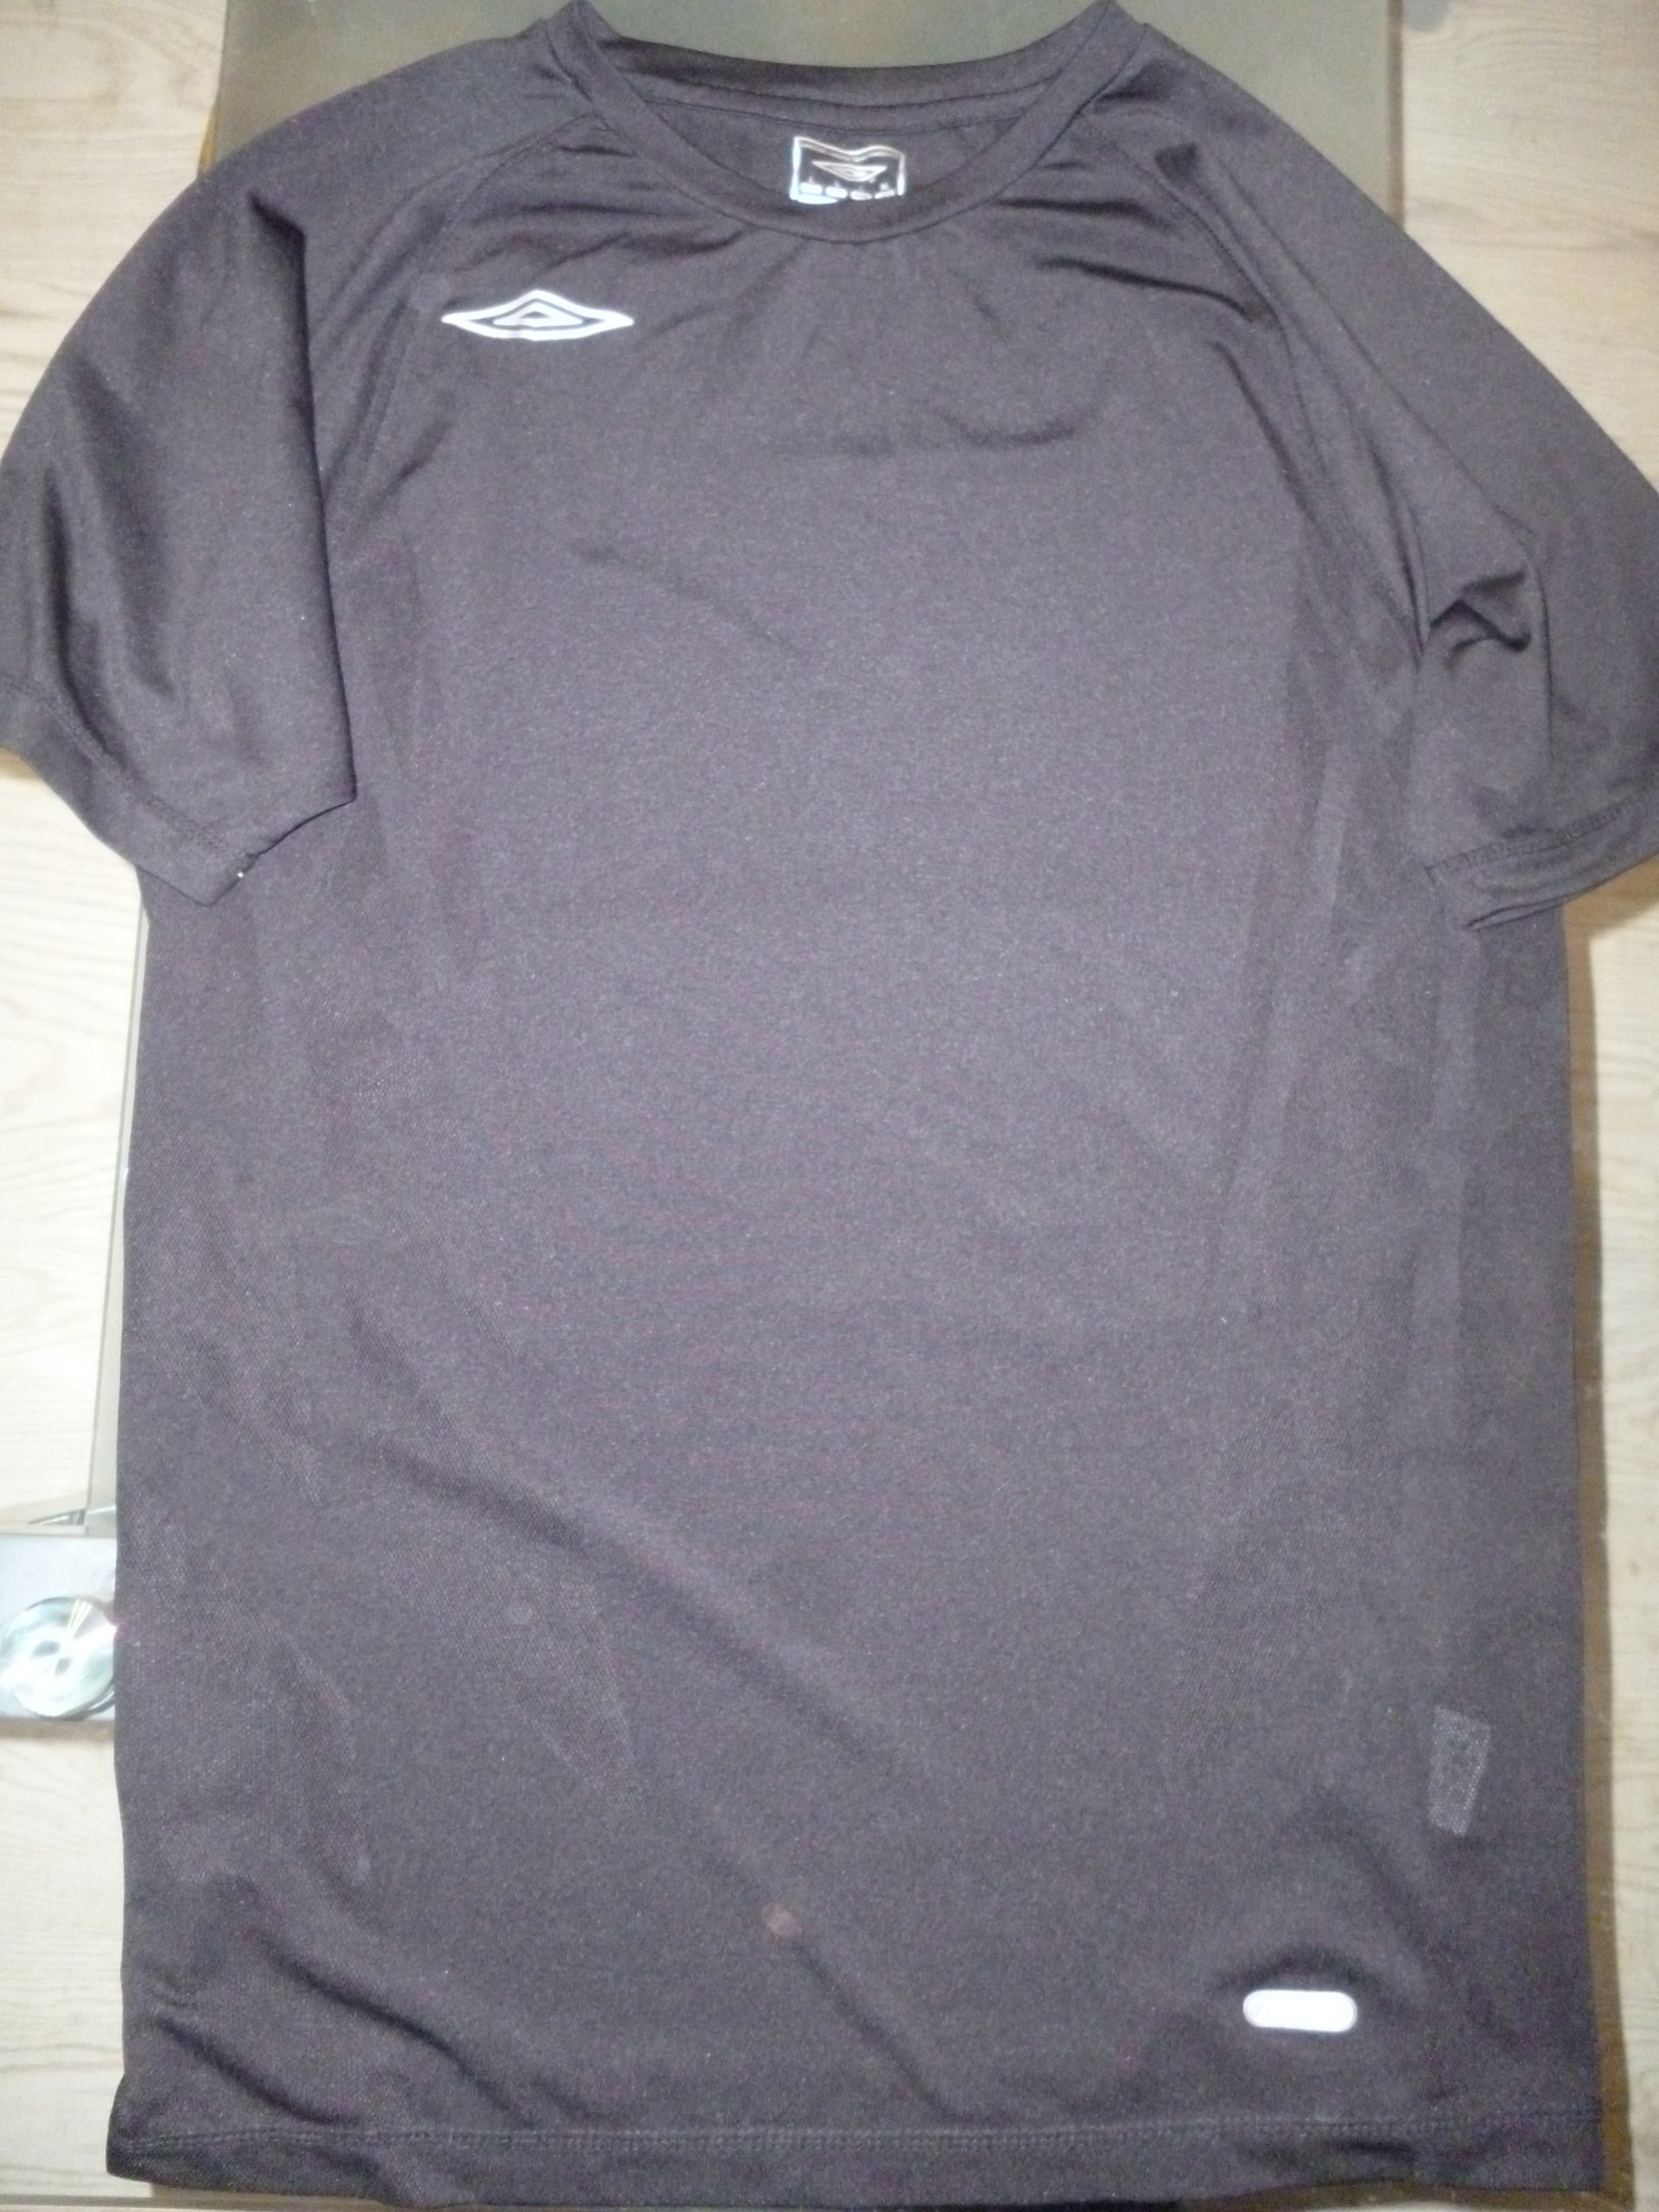 Czarna koszulka sportowa Umbro L